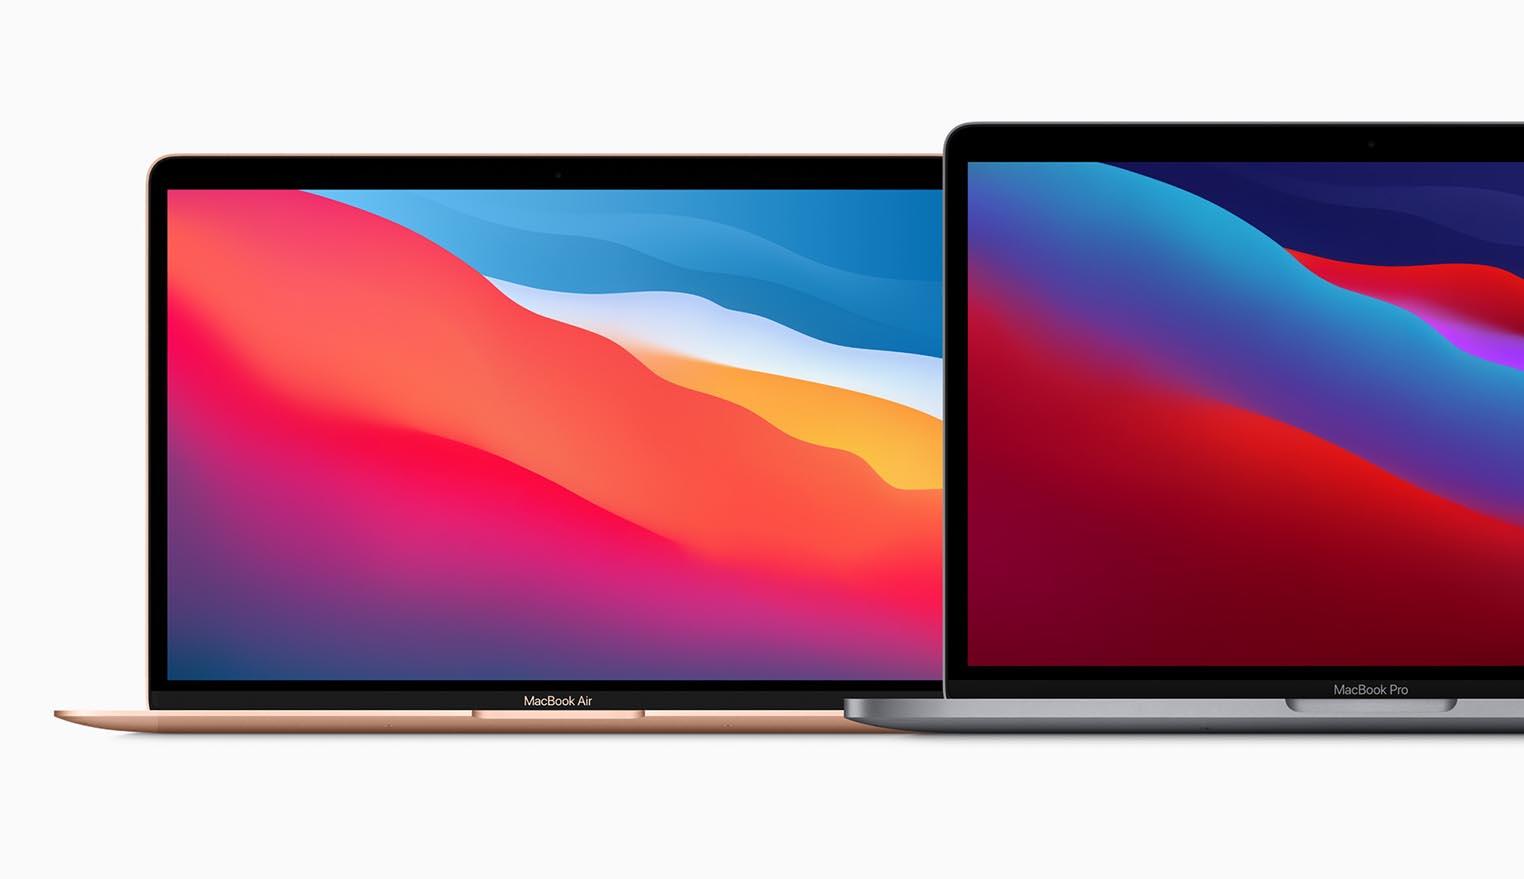 MacBook Air MacBook Pro 13